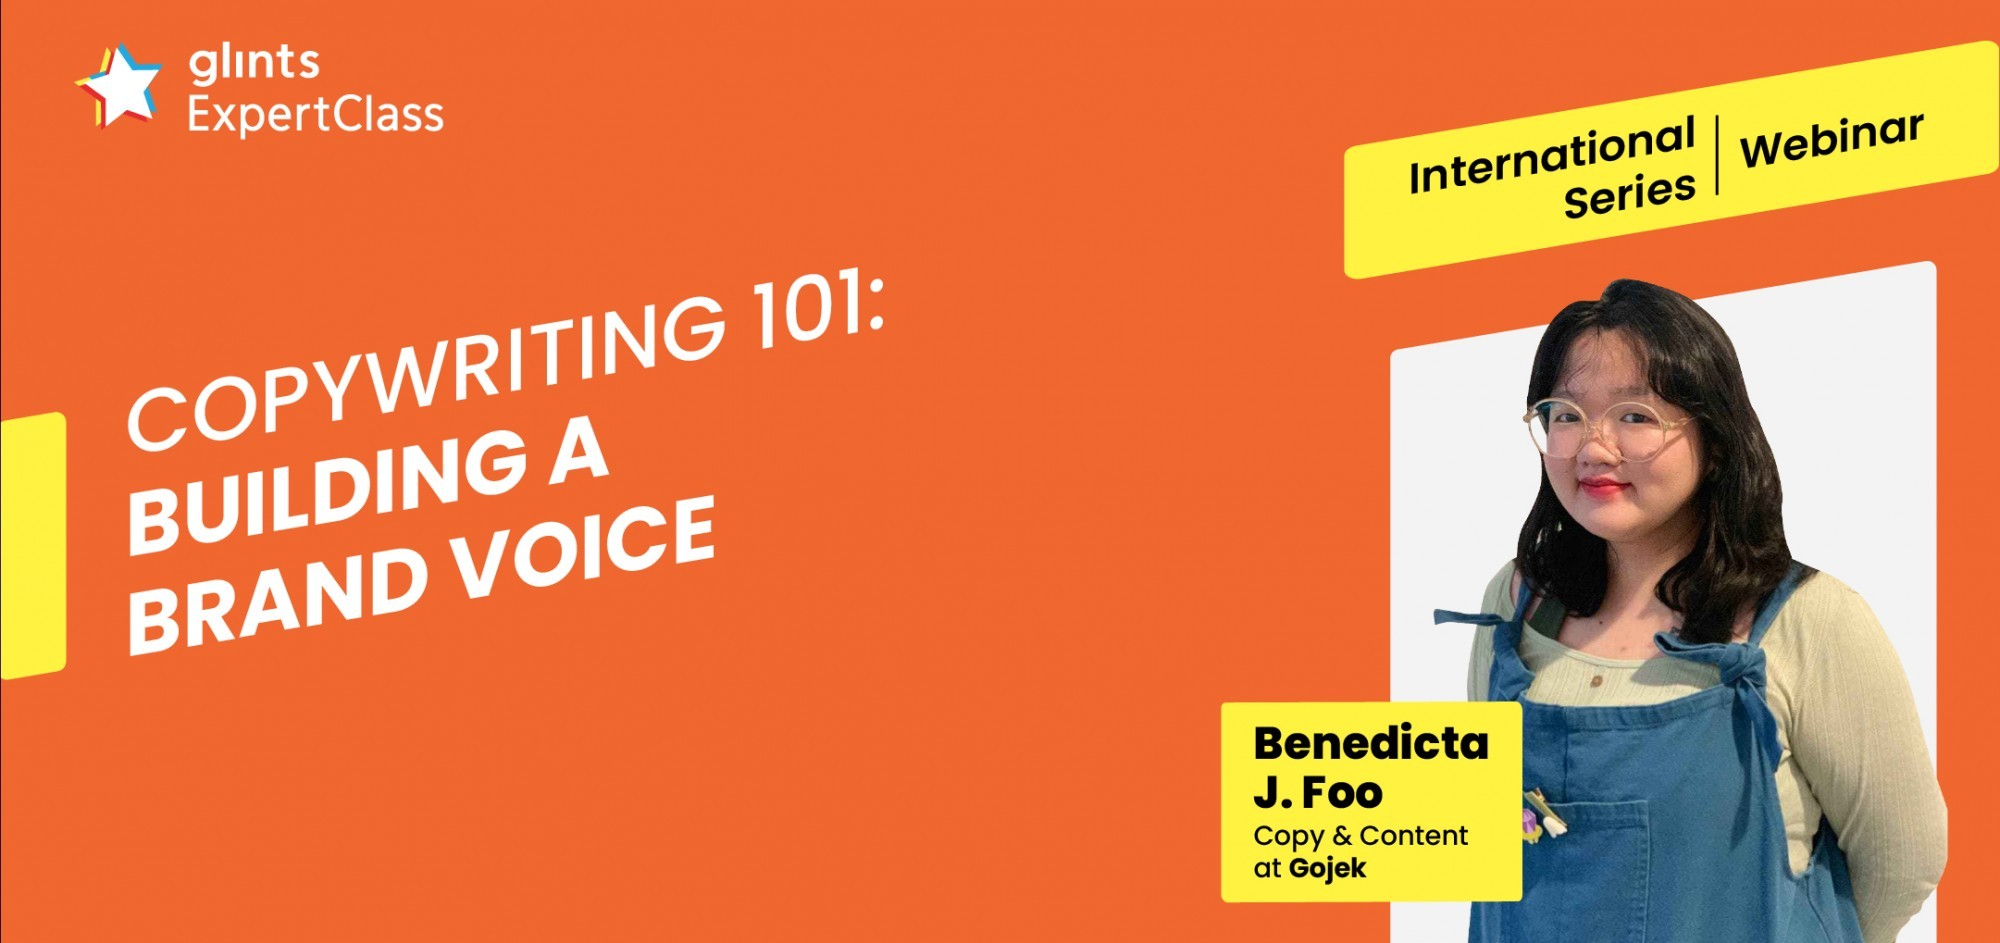 [Glints - GEC International Series] Copywriting 101: Building a Brand Voice